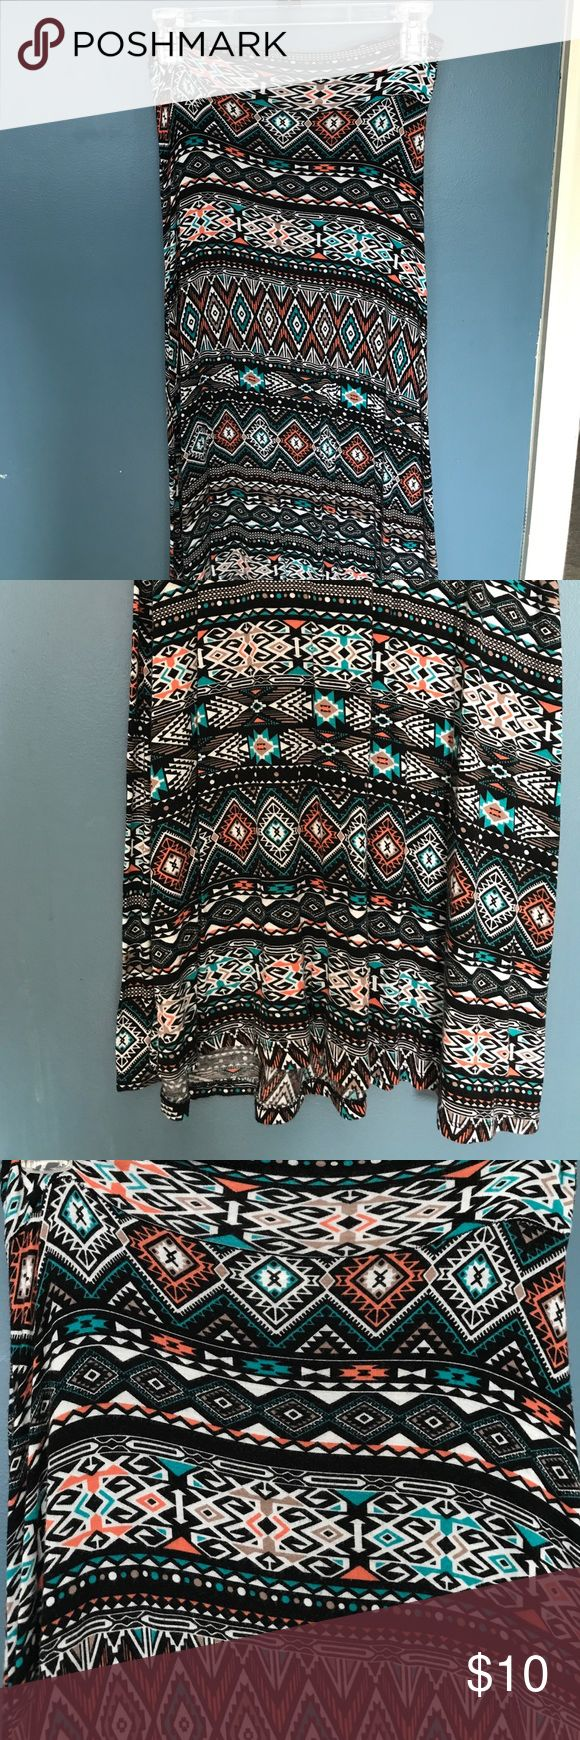 Aztec Maxi Skirt Medium Aztec maxi skirt, soft fabric good length. Skirts Maxi